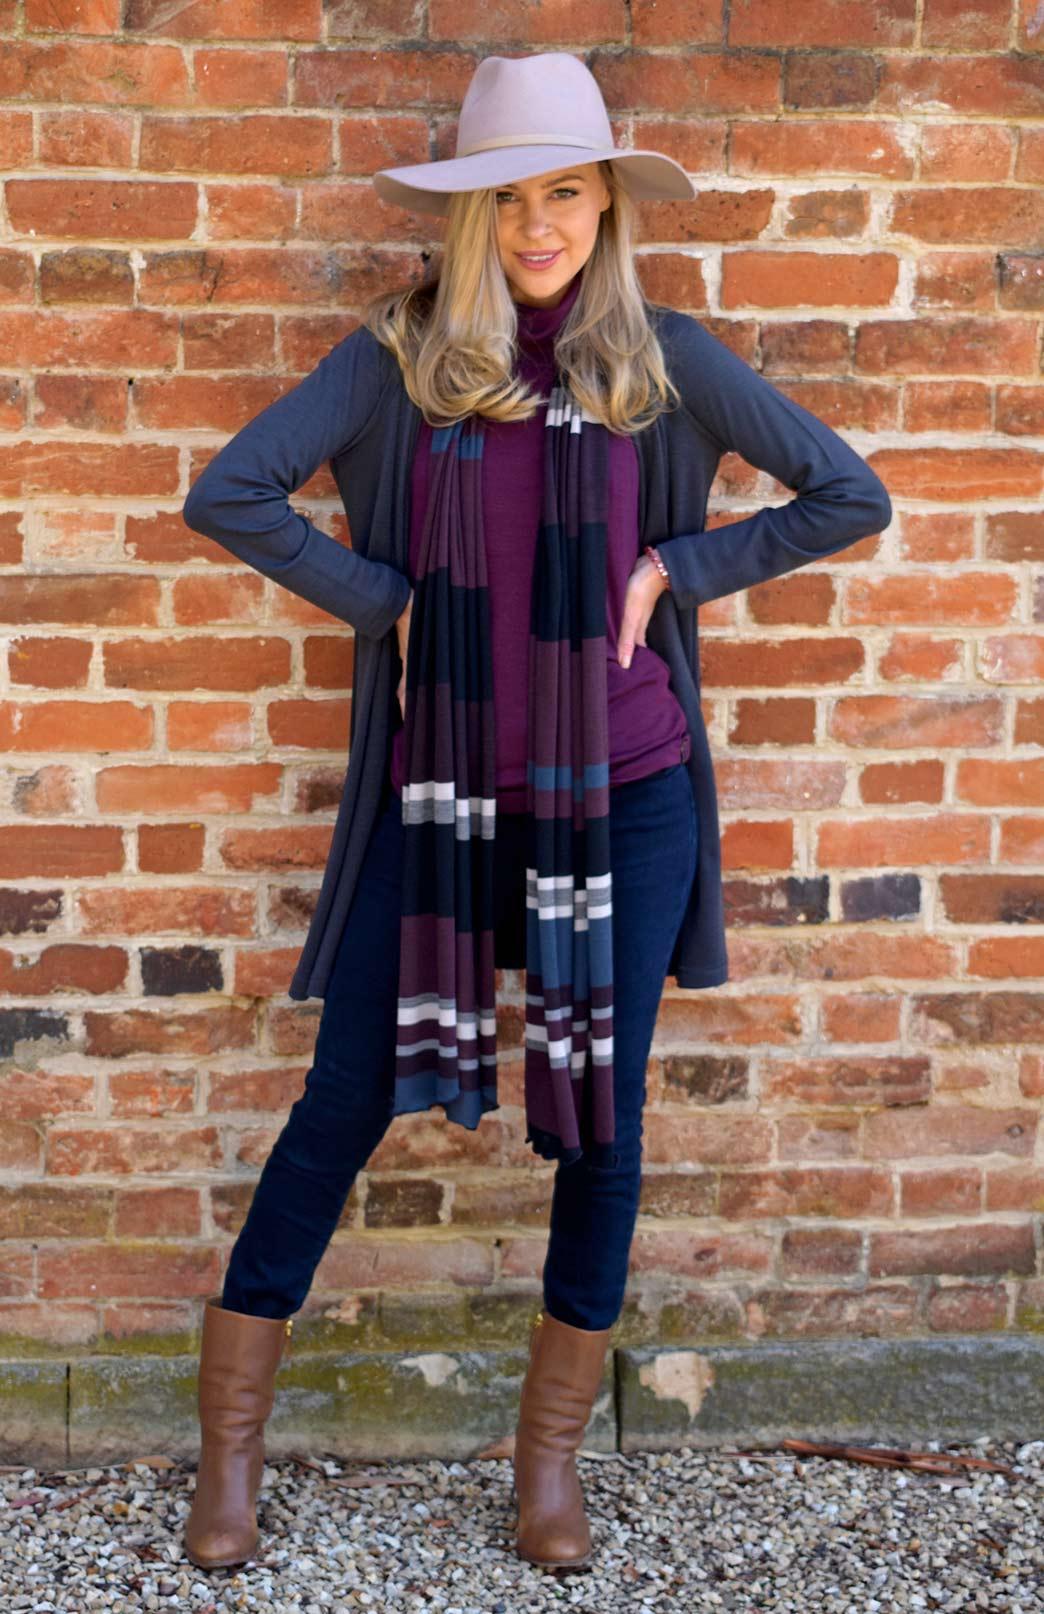 Drape Cardigan - Heavyweight - Women's Lead Grey Wool Drape Cardigan with no zips or fastenings - Smitten Merino Tasmania Australia